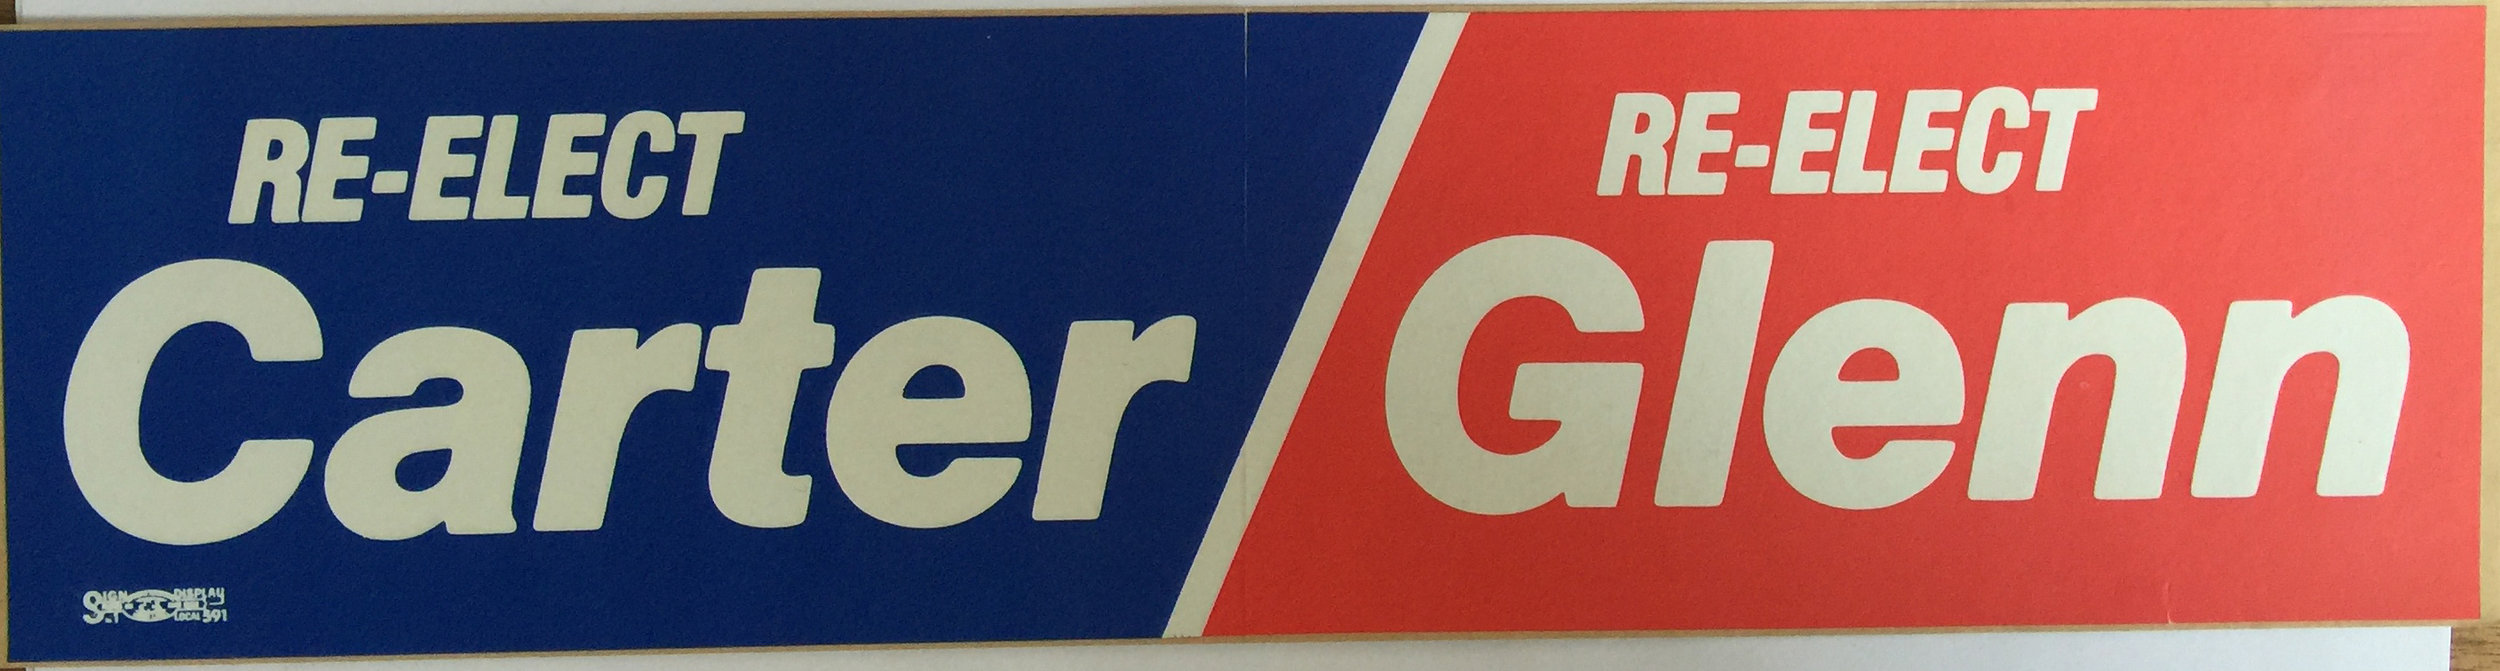 STICKER-uss GLENN 3.jpg